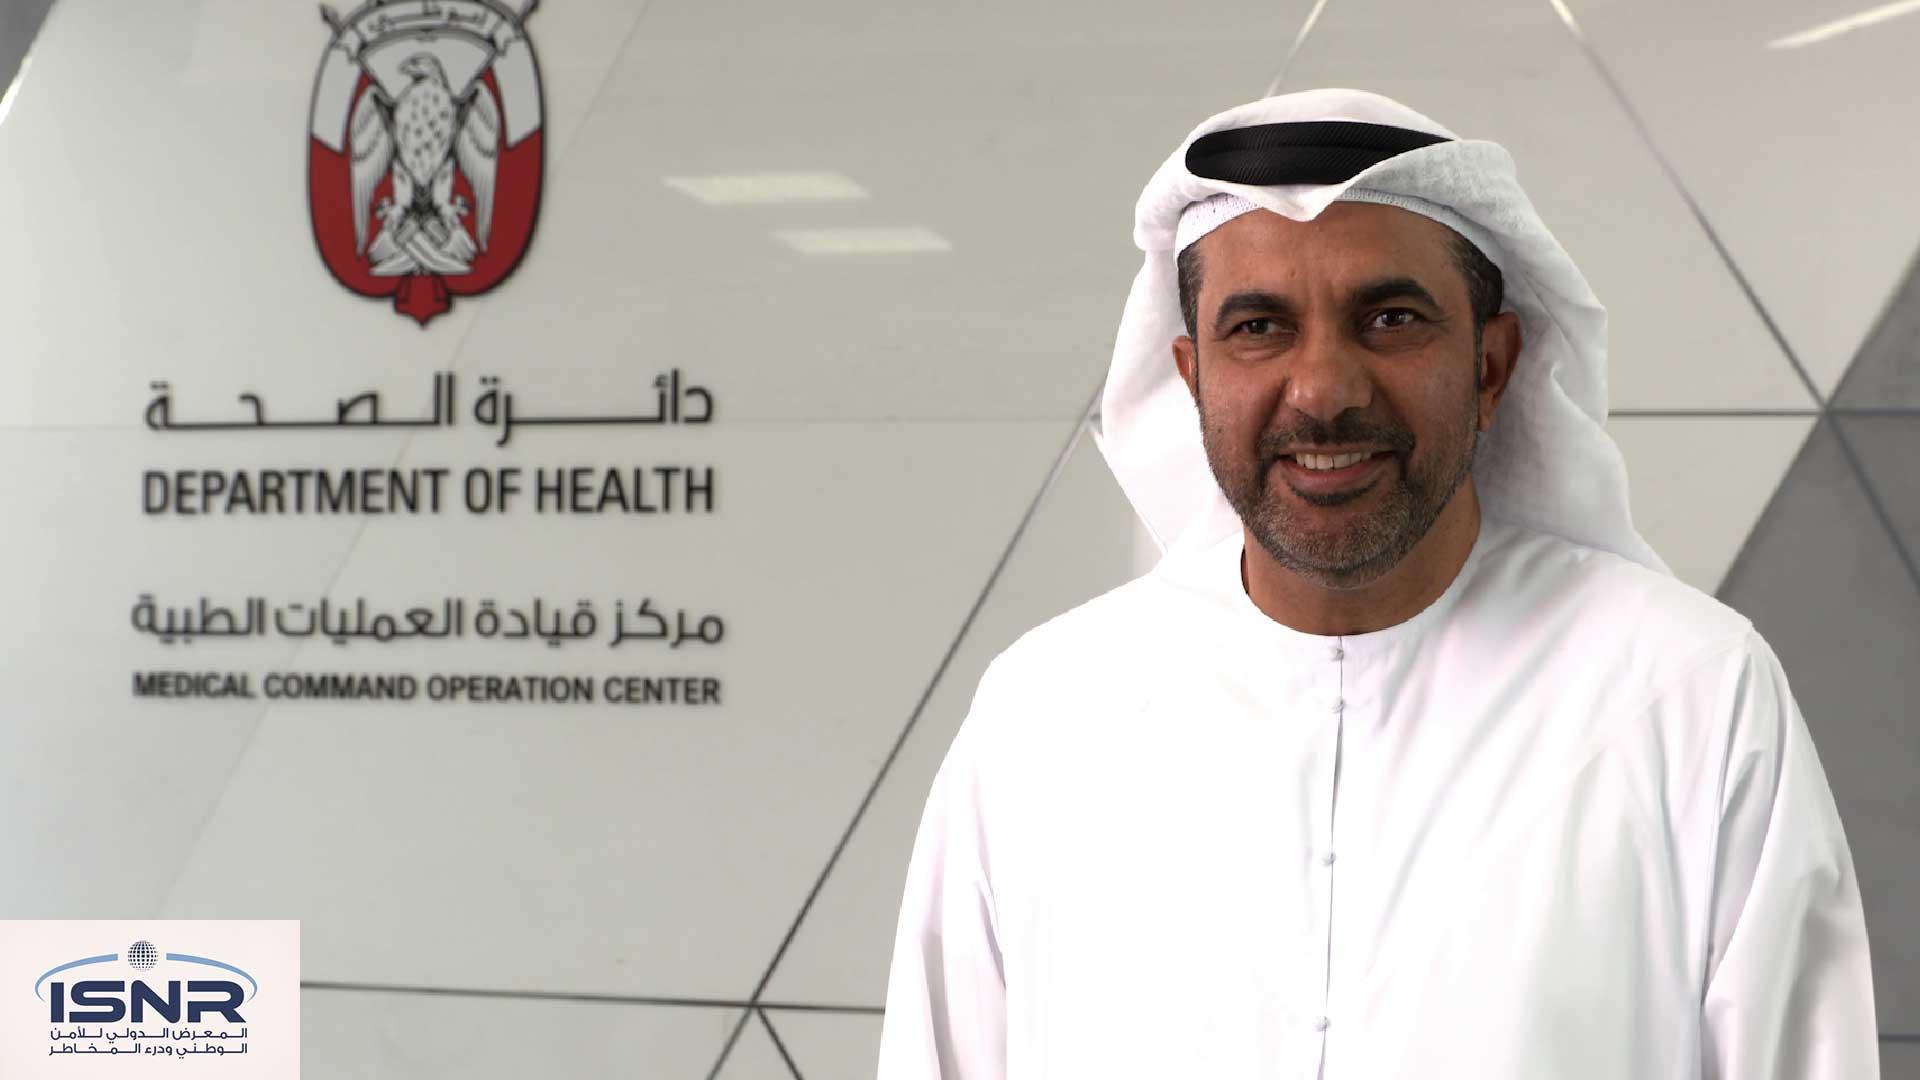 ISNR Interview Deprartment of Health